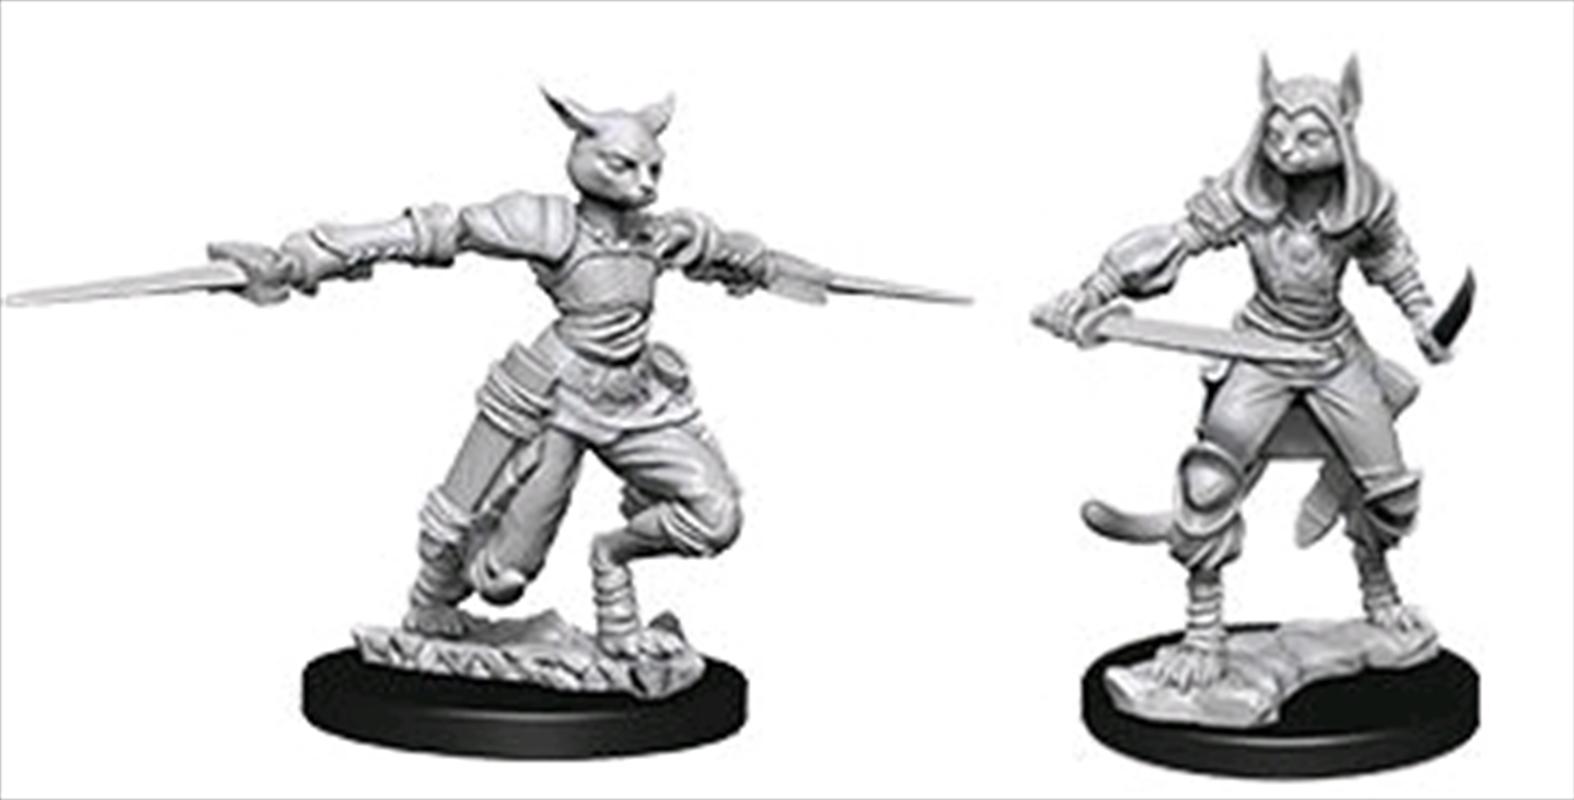 Dungeons & Dragons - Nolzur's Marvelous Unpainted Minis: Unpainted Female Tabaxi Rogue | Games